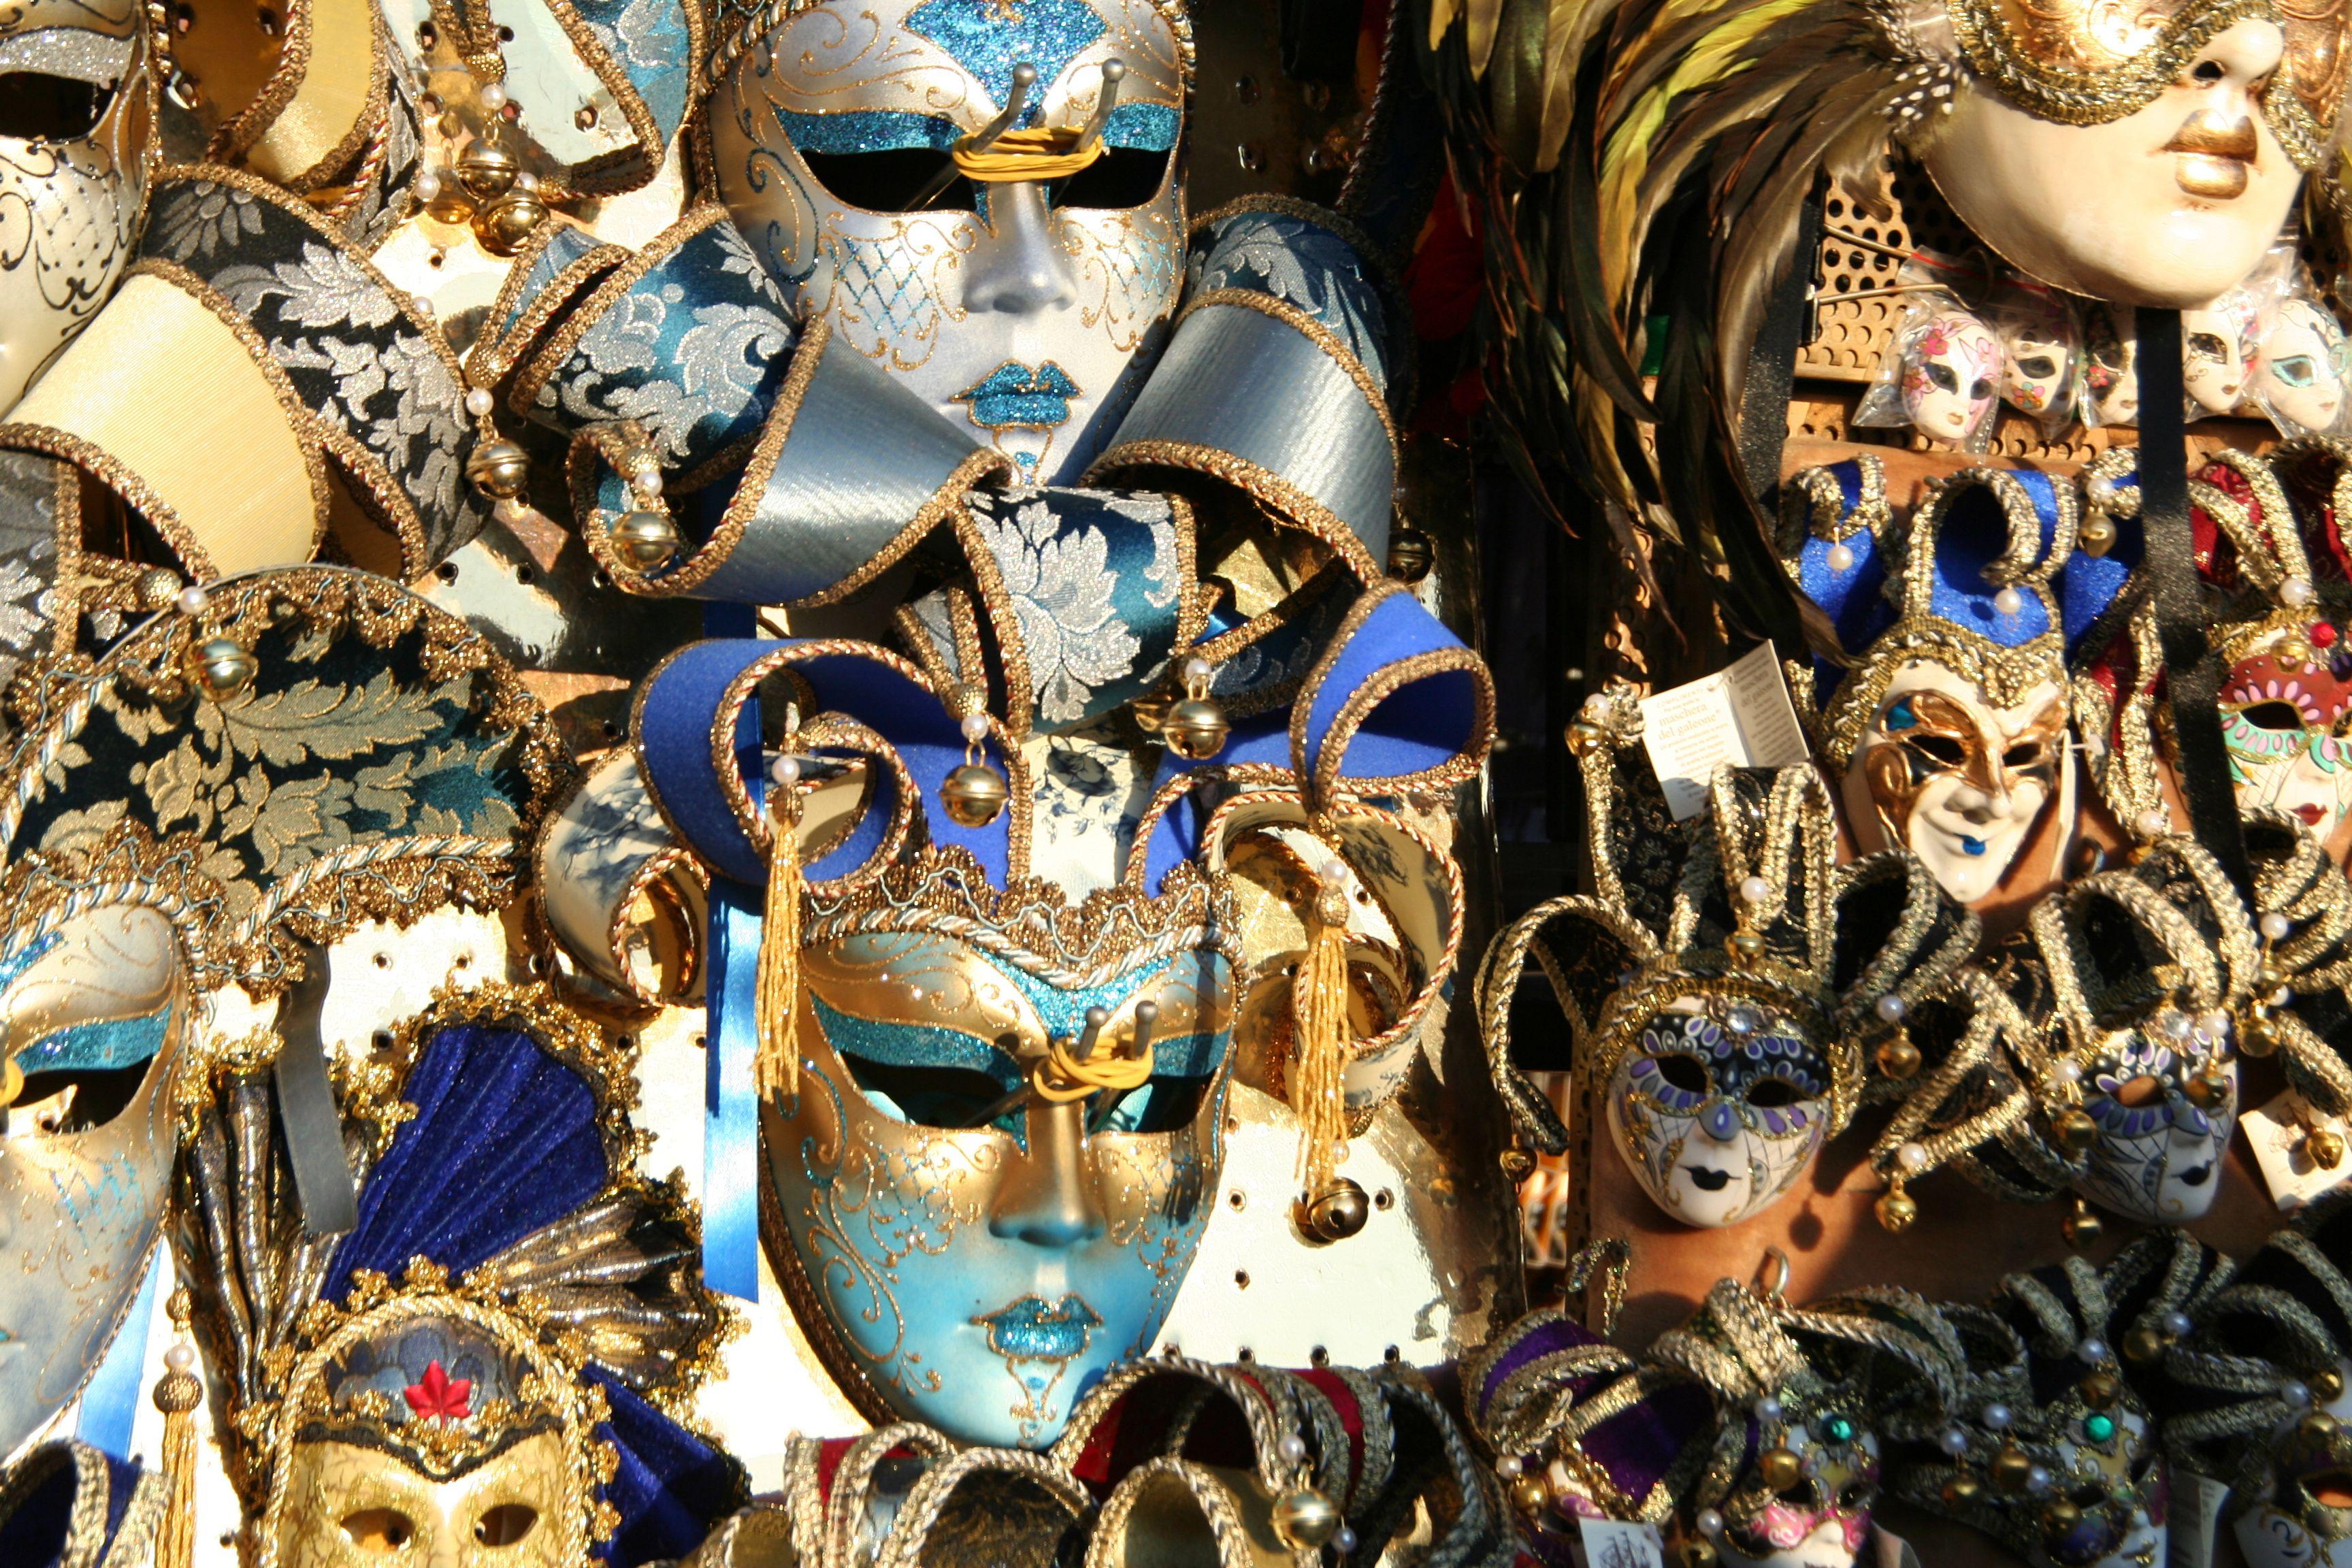 Multi-colored masks